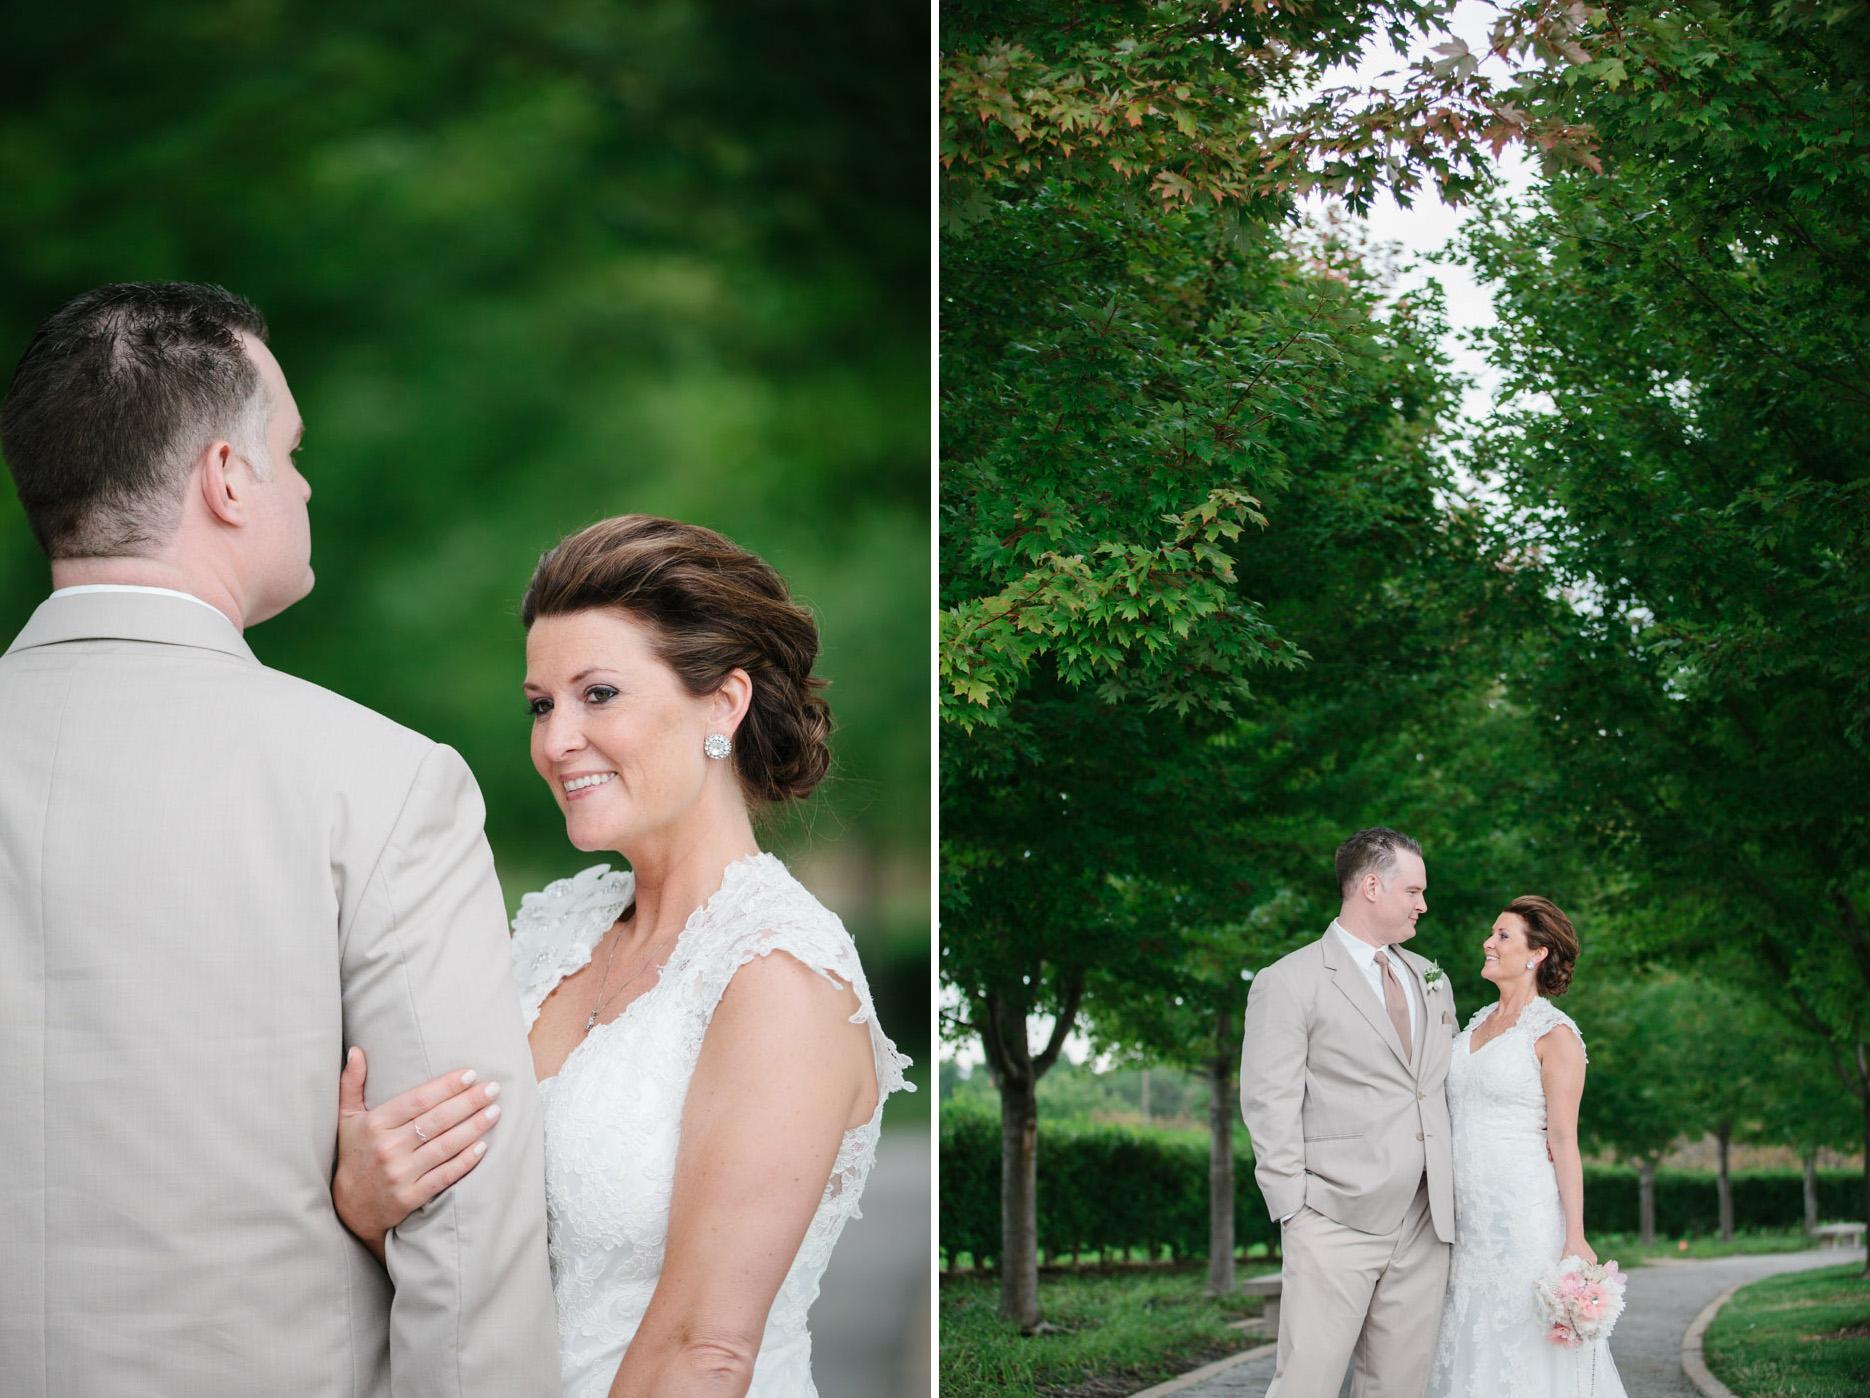 St-Louis-Wedding-Photography-1051-copy.jpg